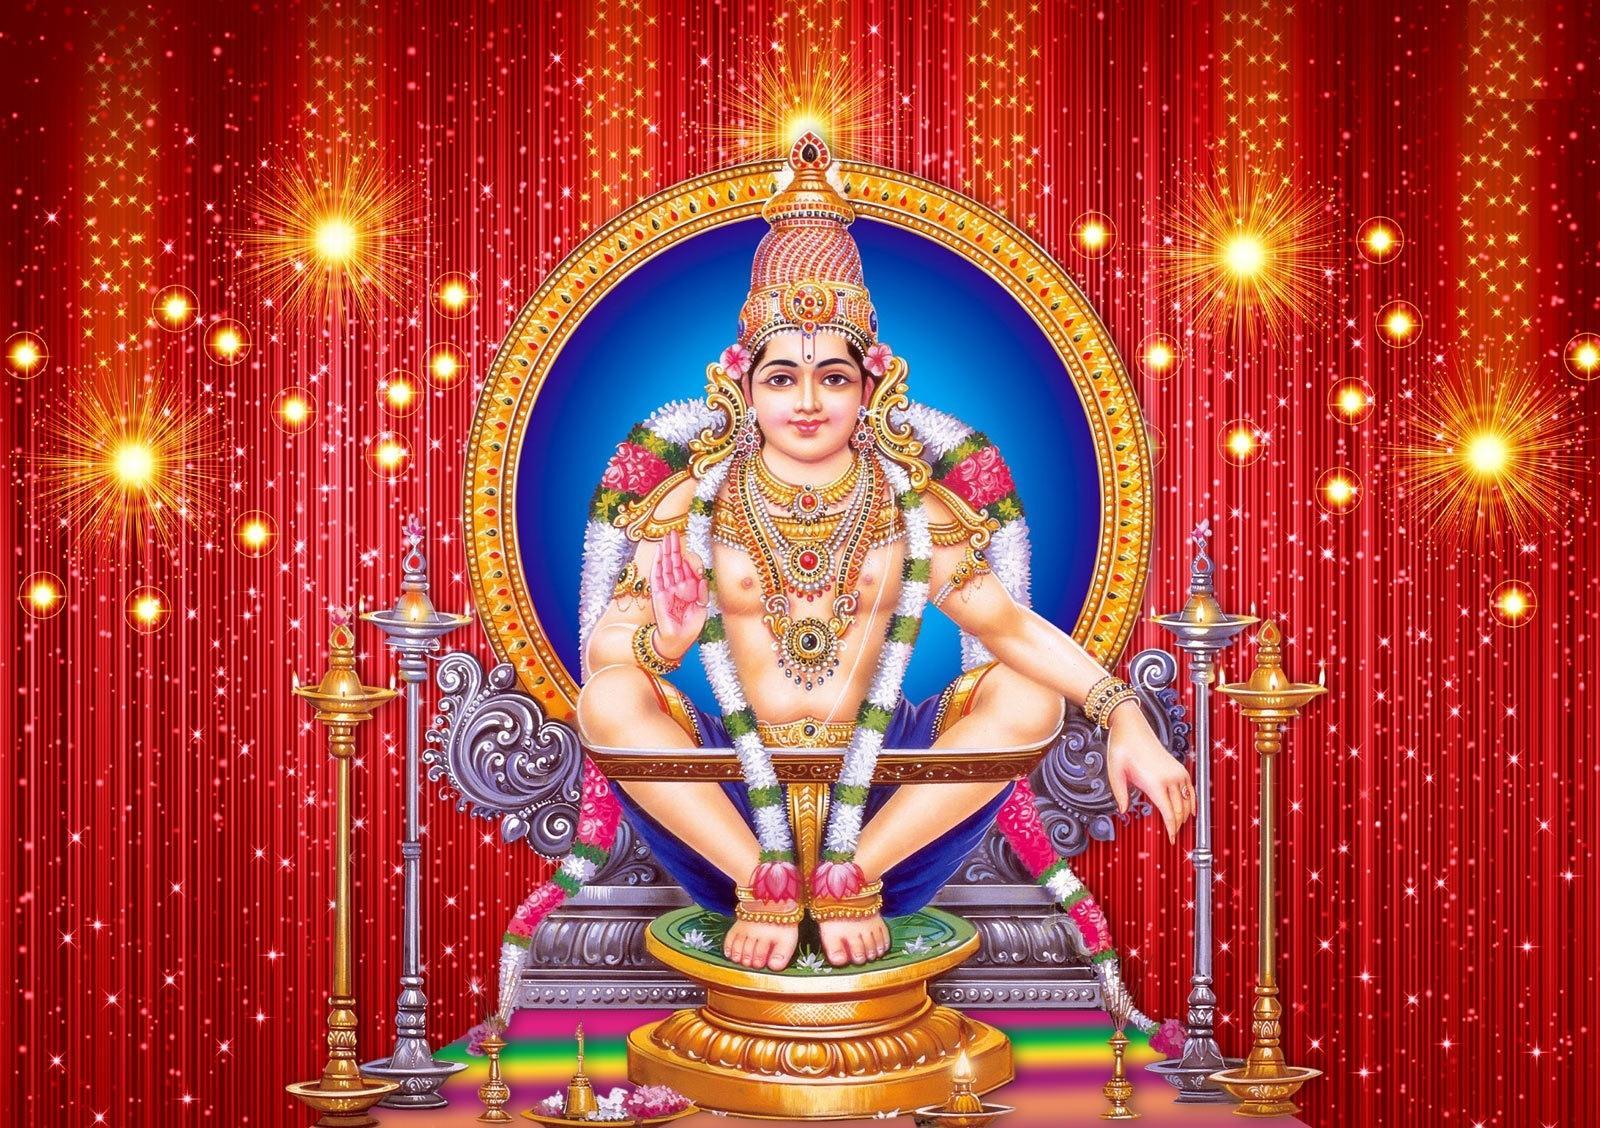 Ayyappan Photos Download Masstamilan : Ilayaraja songs